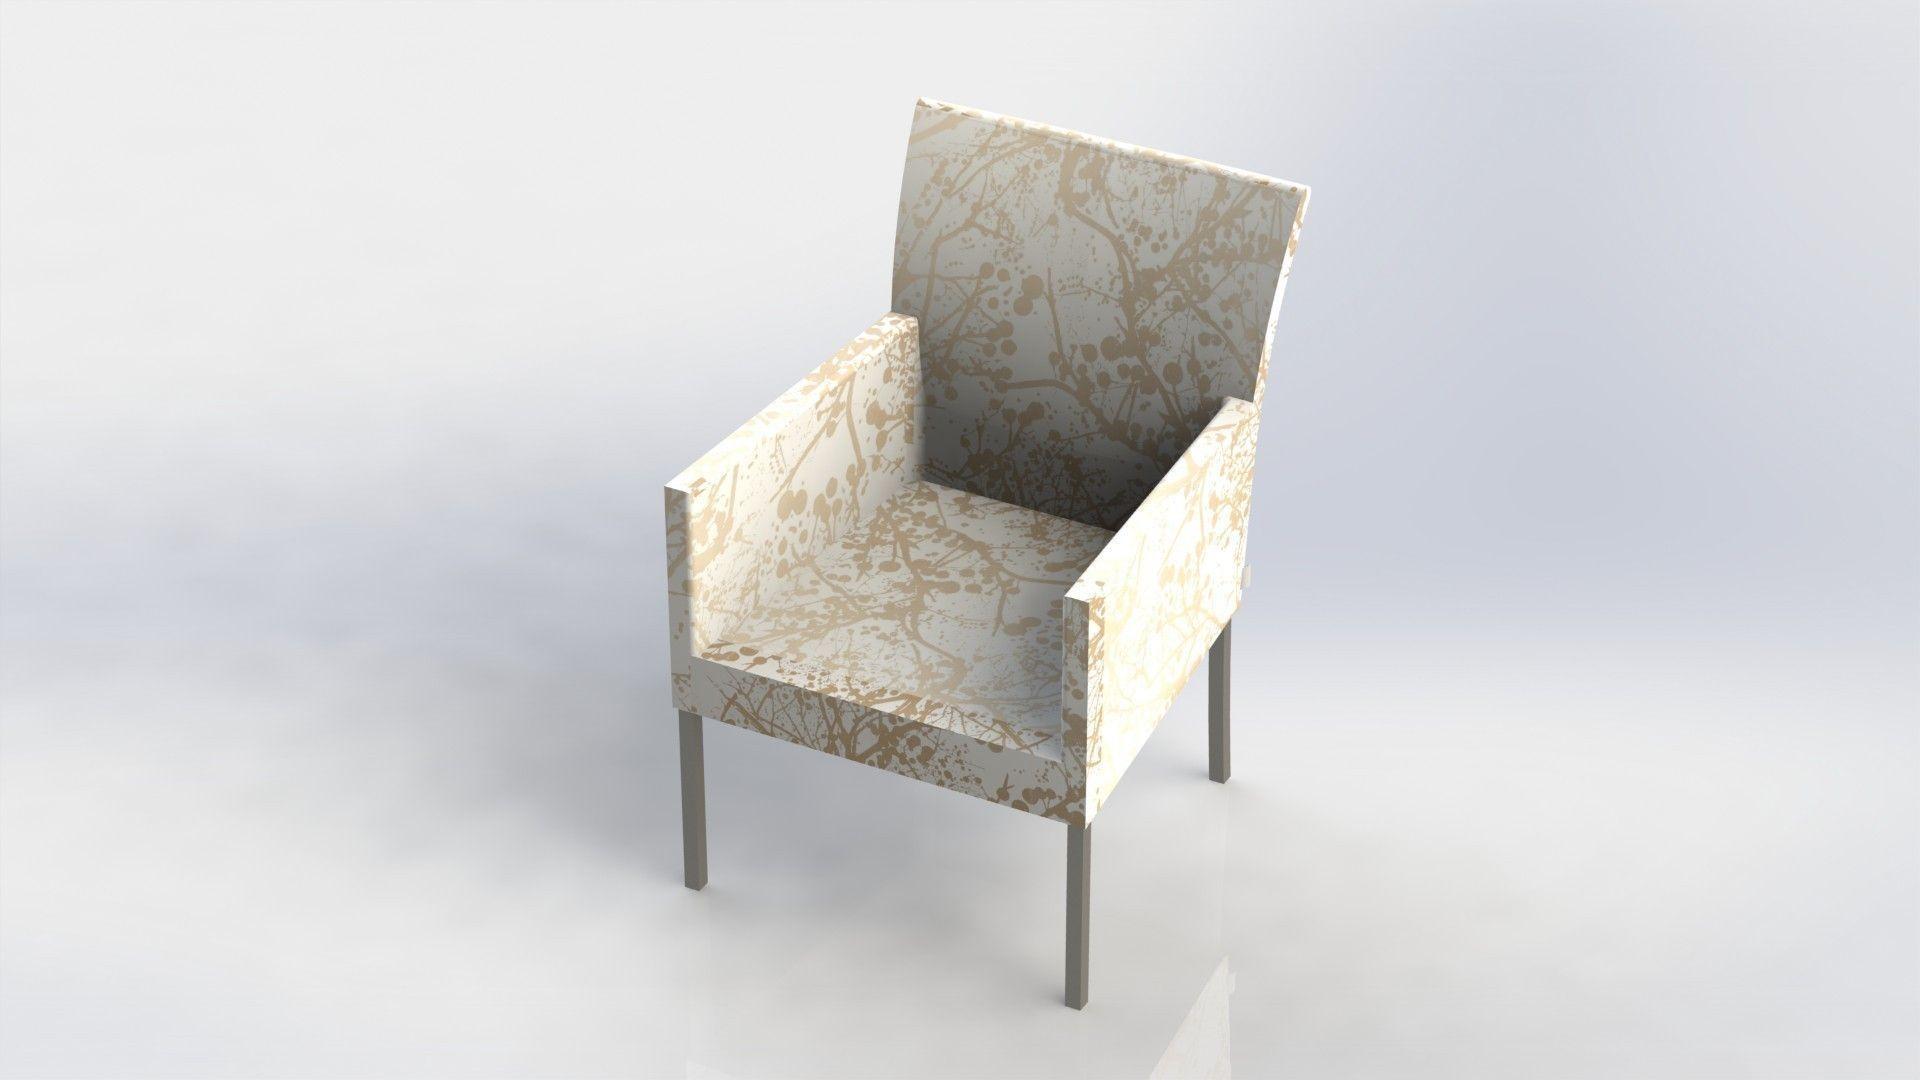 Diner chair stoel stuhl silla chaise 3d model stl for Chaise modele